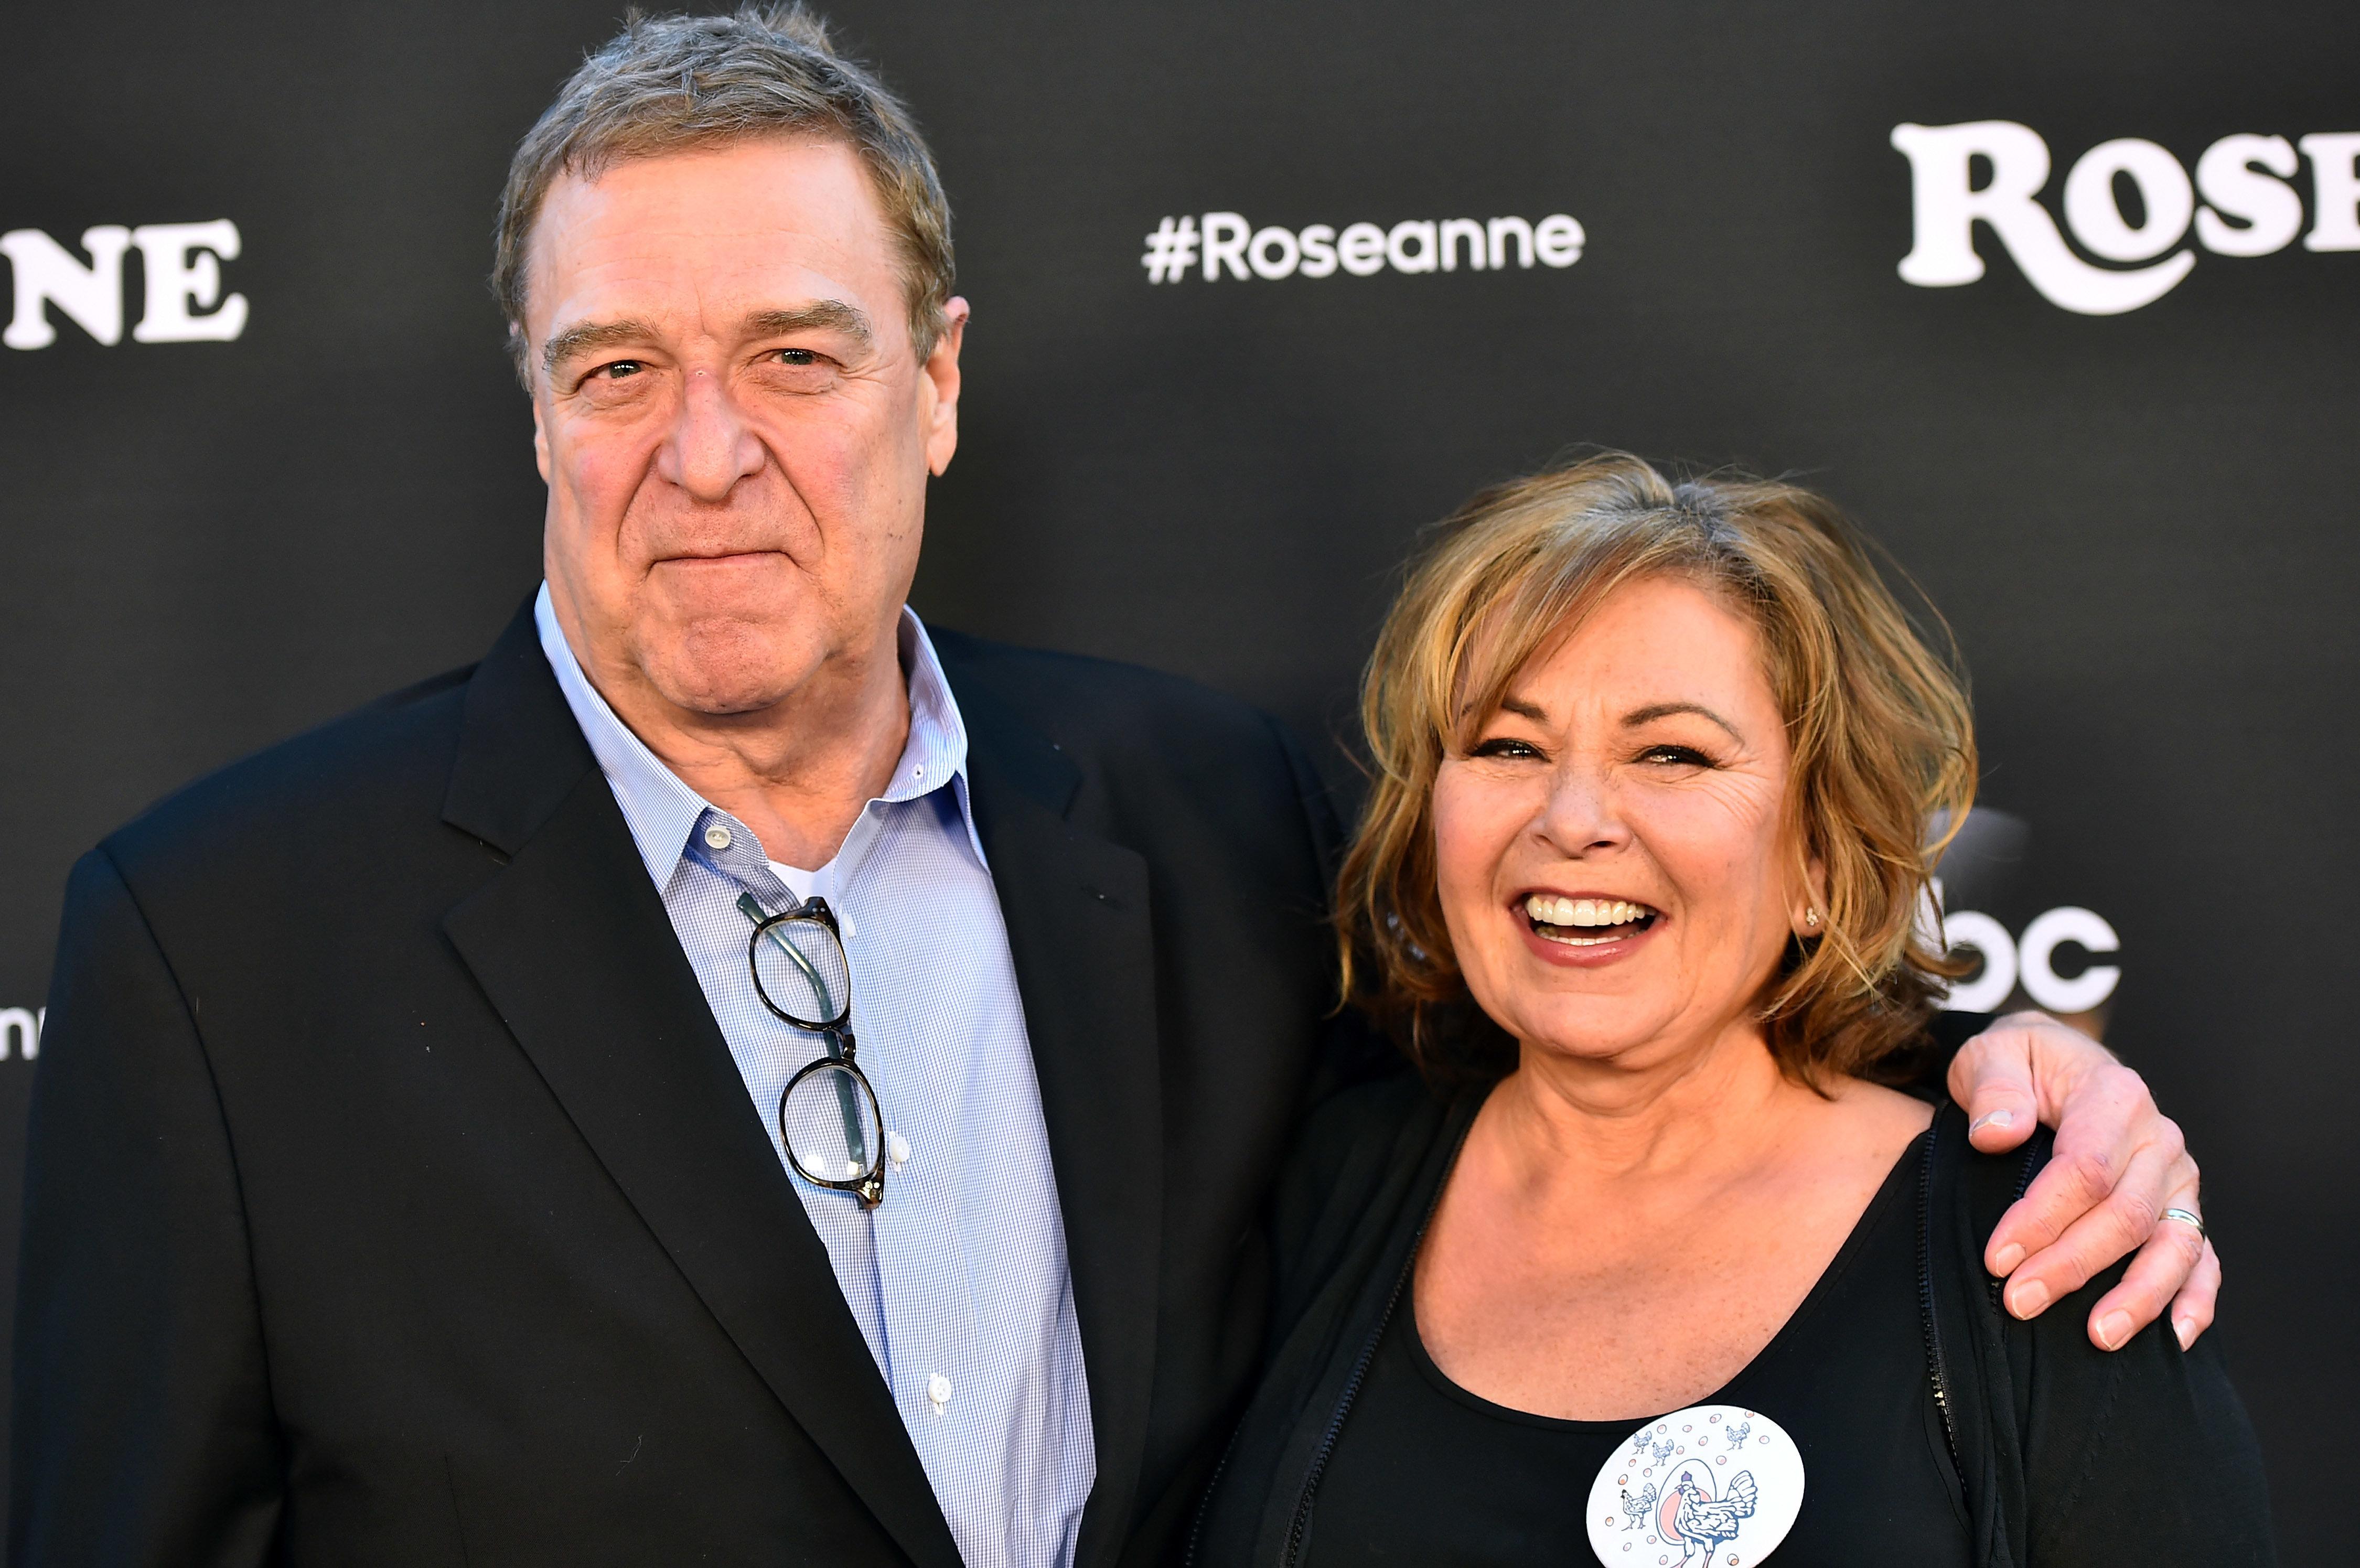 John Goodman Interview: Does Roseanne Die in 'Conners' Premiere?